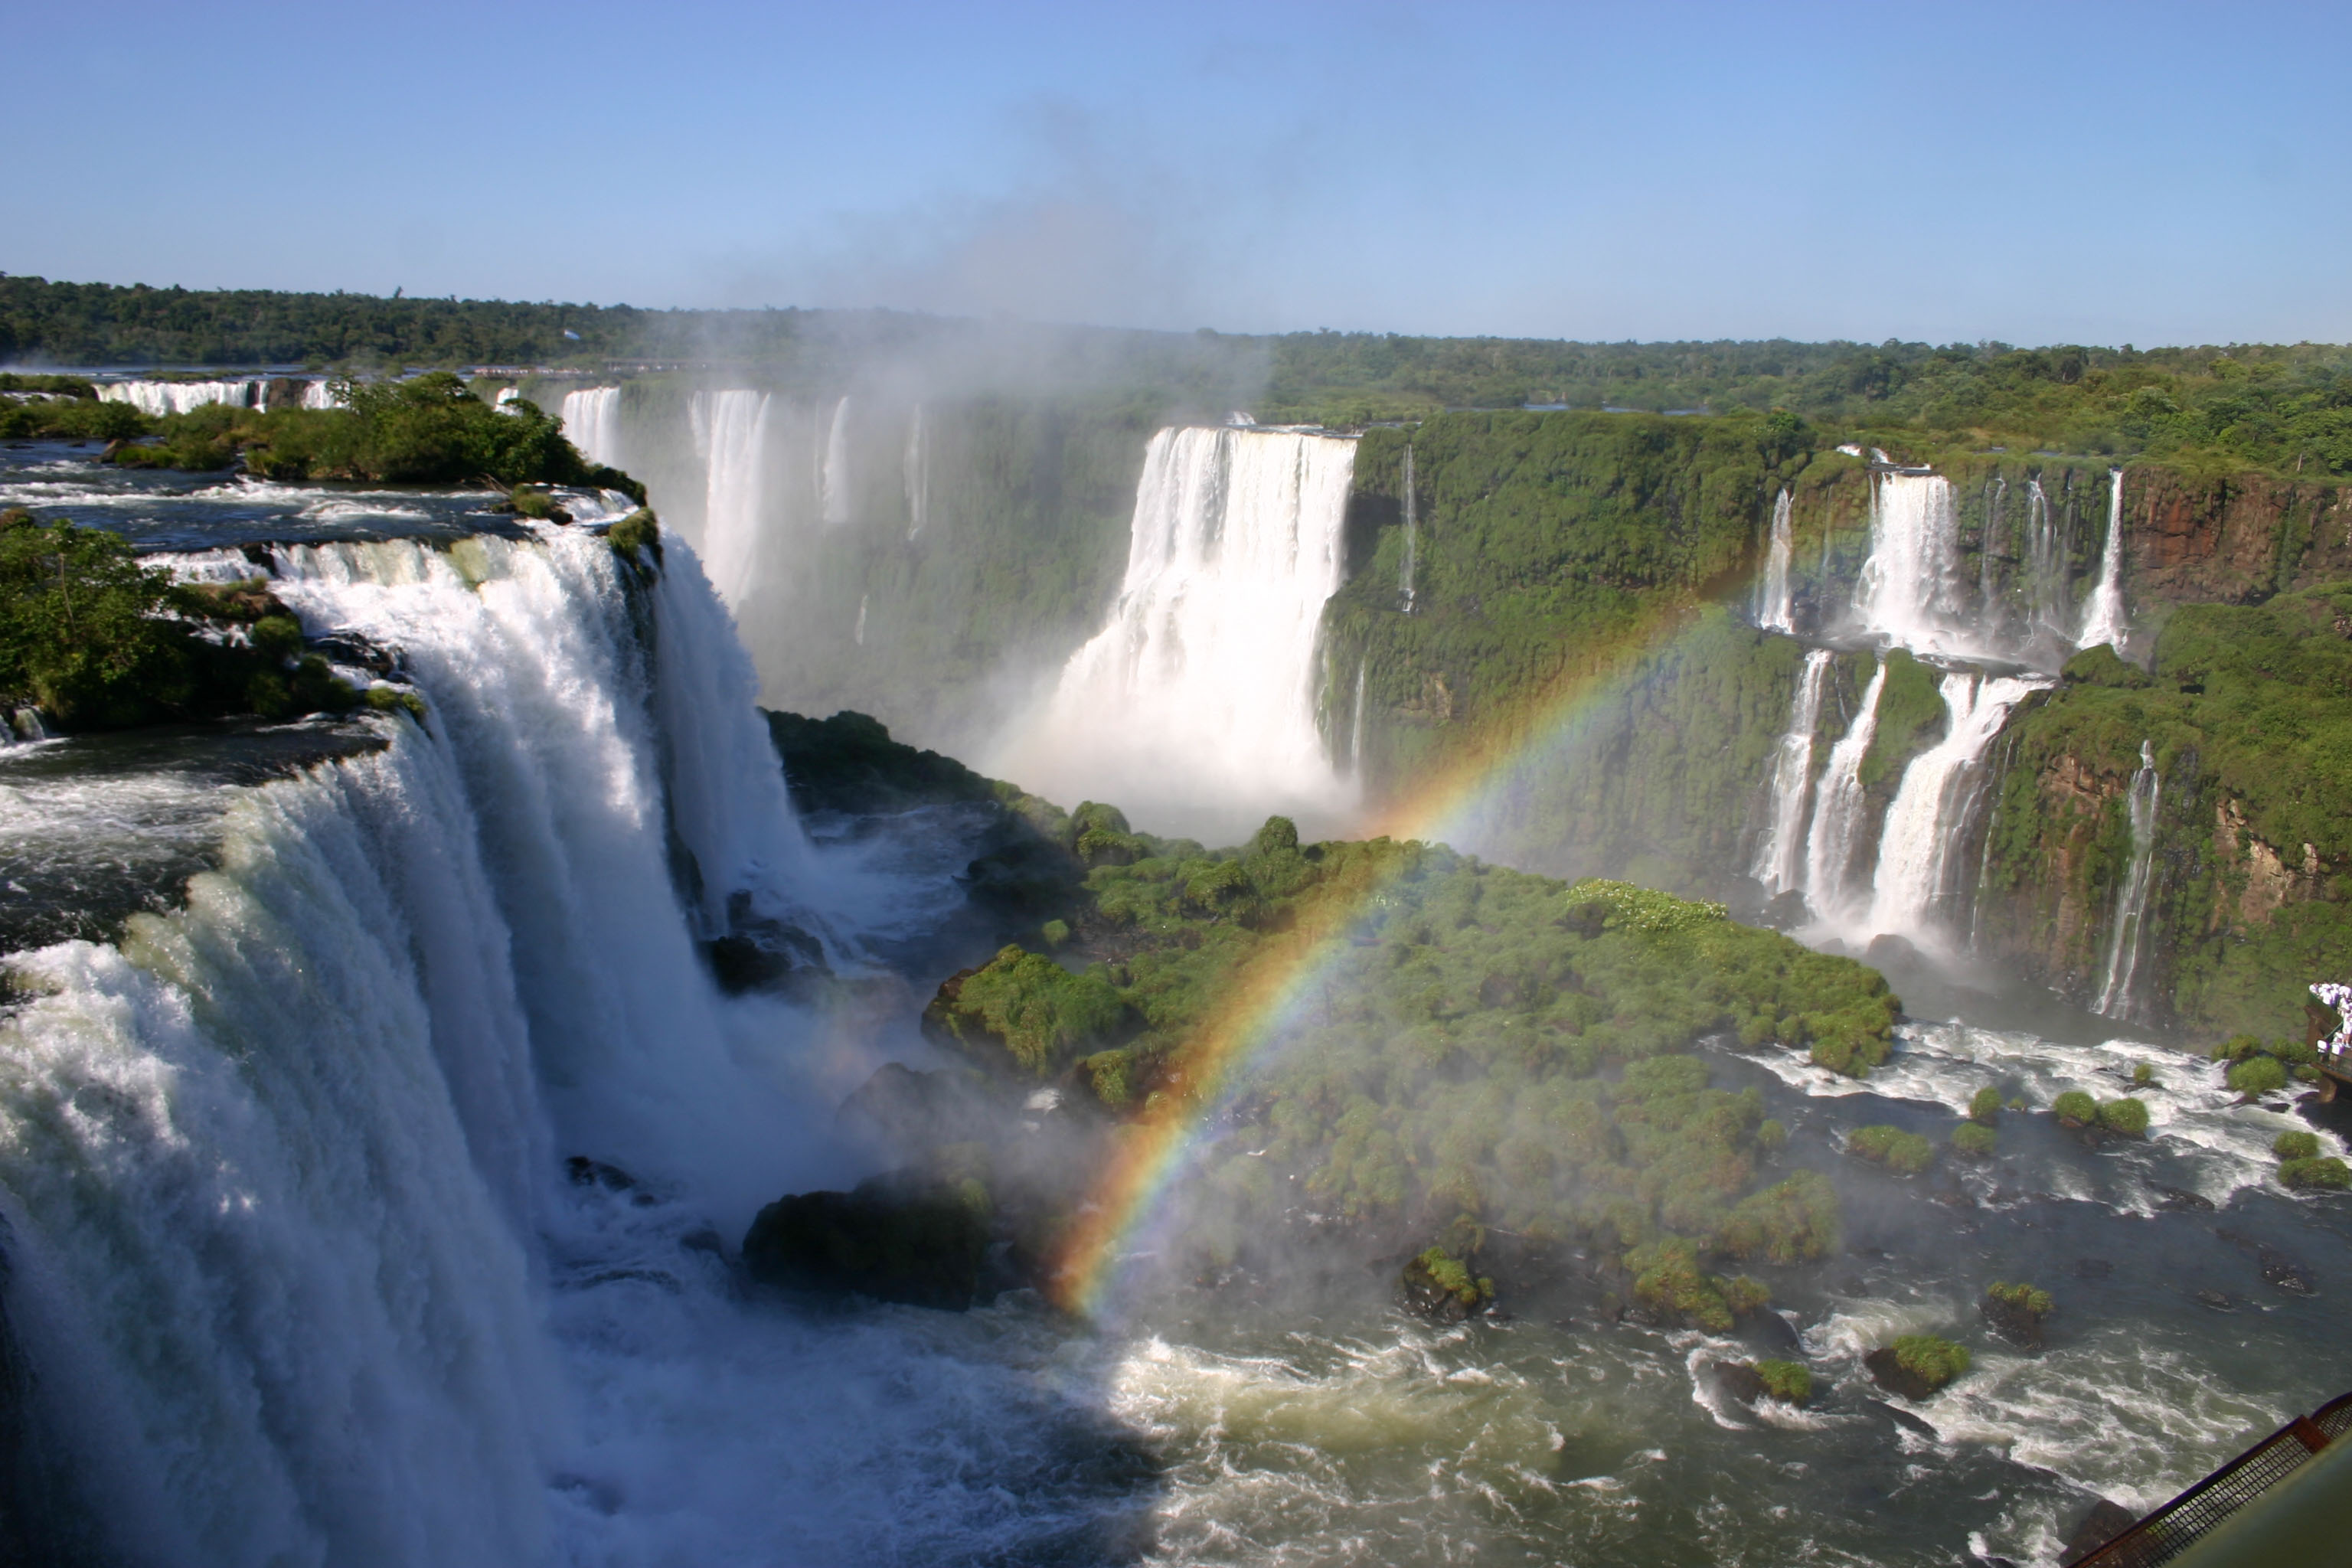 Iguazu Falls Backgrounds on Wallpapers Vista